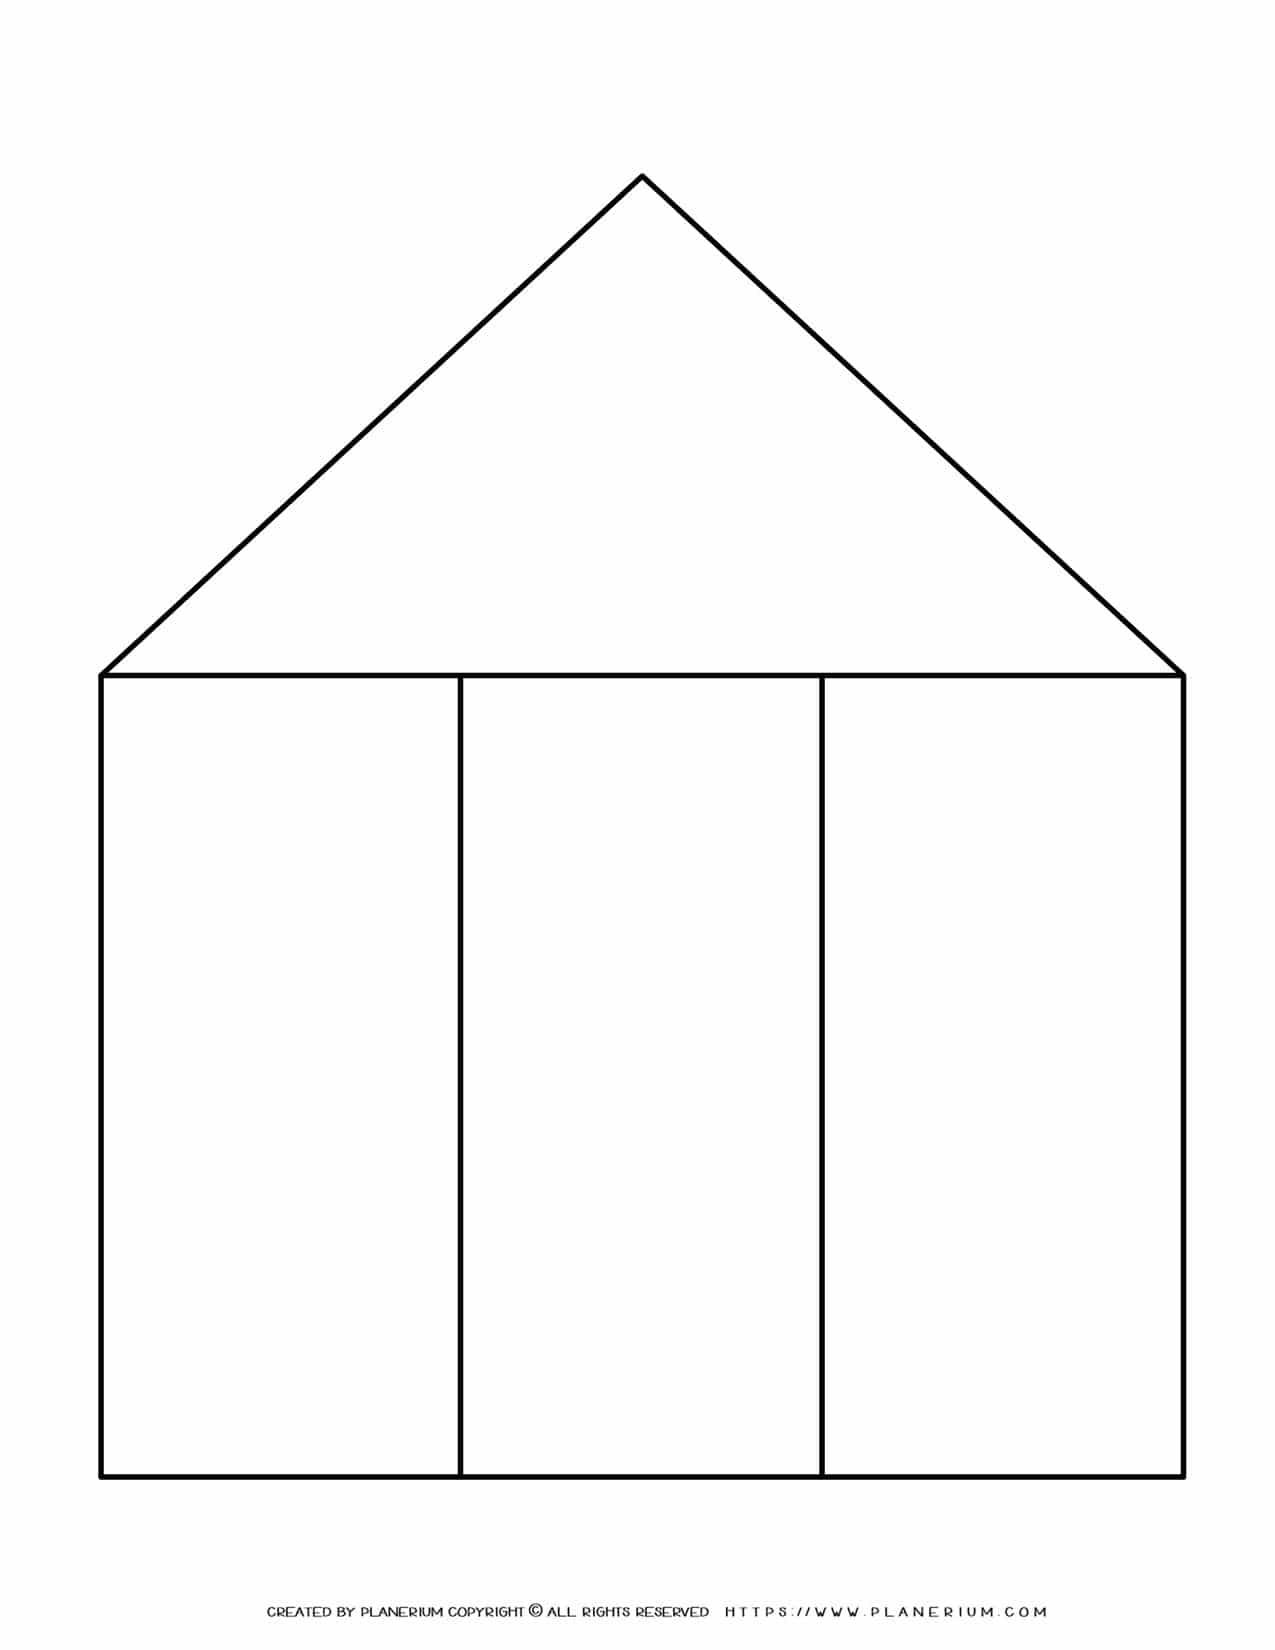 Graphic Organizer Templates - House Chart with Three Columns   Planerium